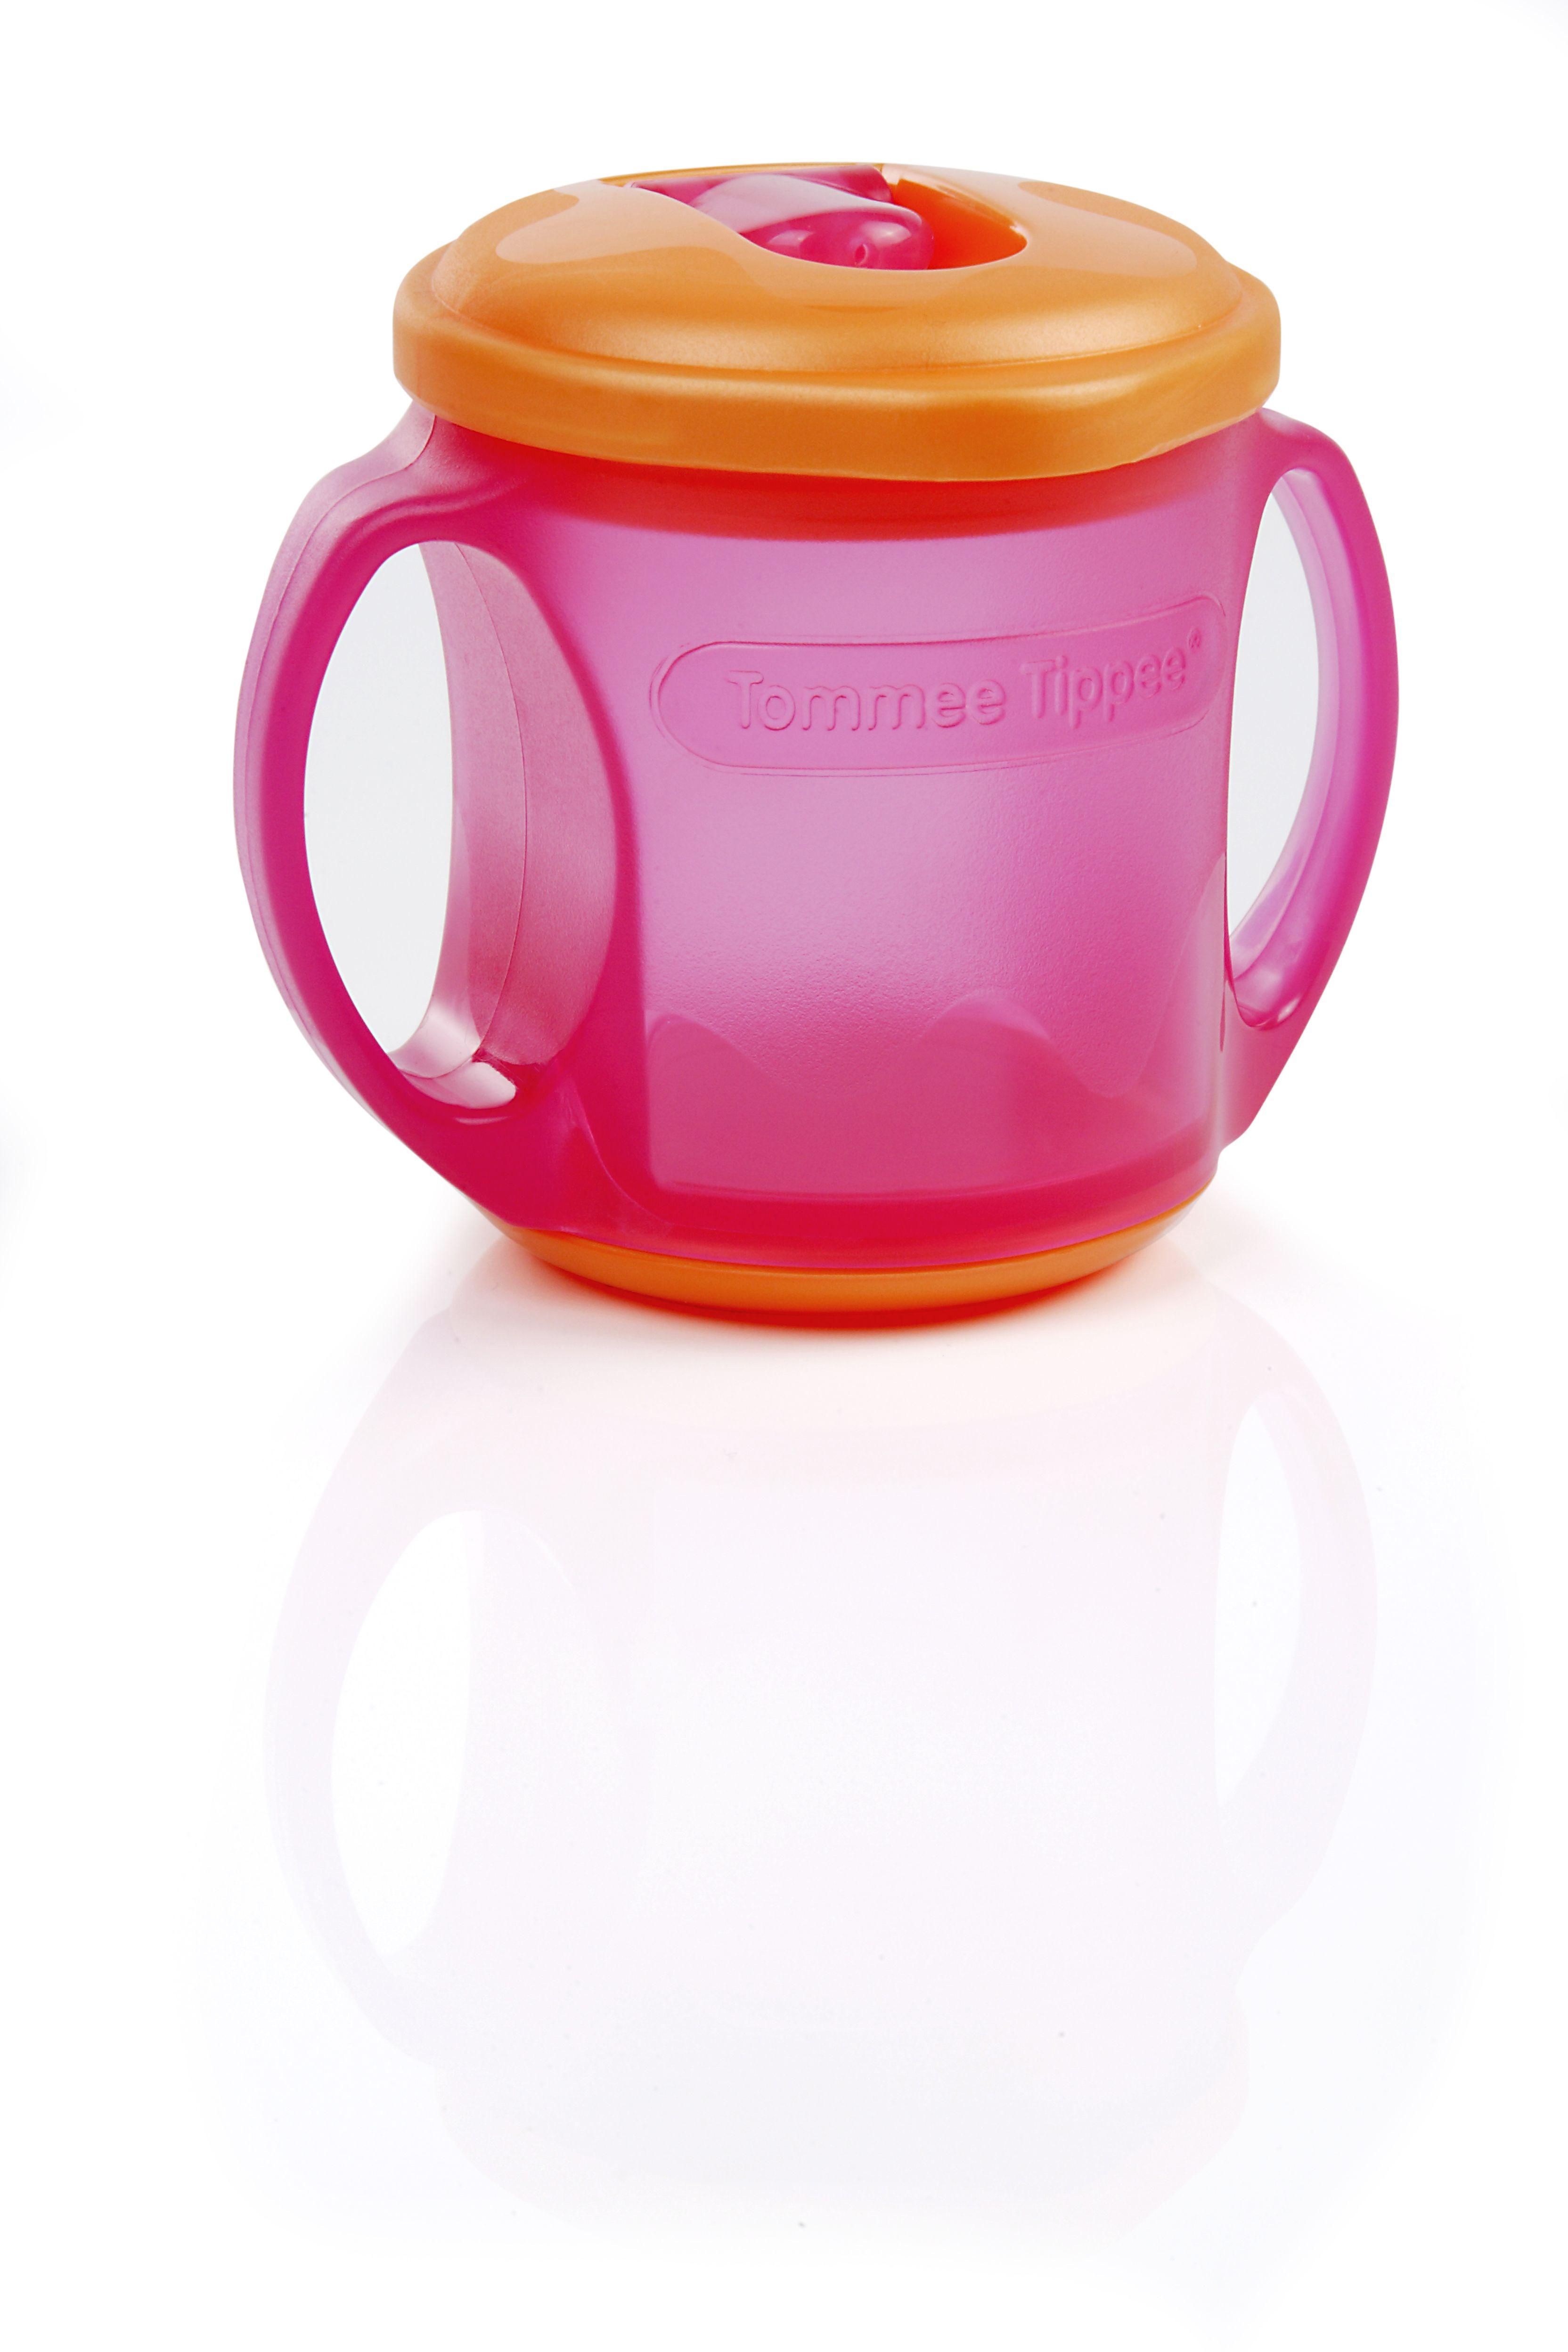 Tommee Tippee 174 Sip N Seal Cup Tommeetippeeau Cups Sippycups Pink Orange Toddlercup Cupwithhandles Bpafree Tommee Tippee 174 Baby